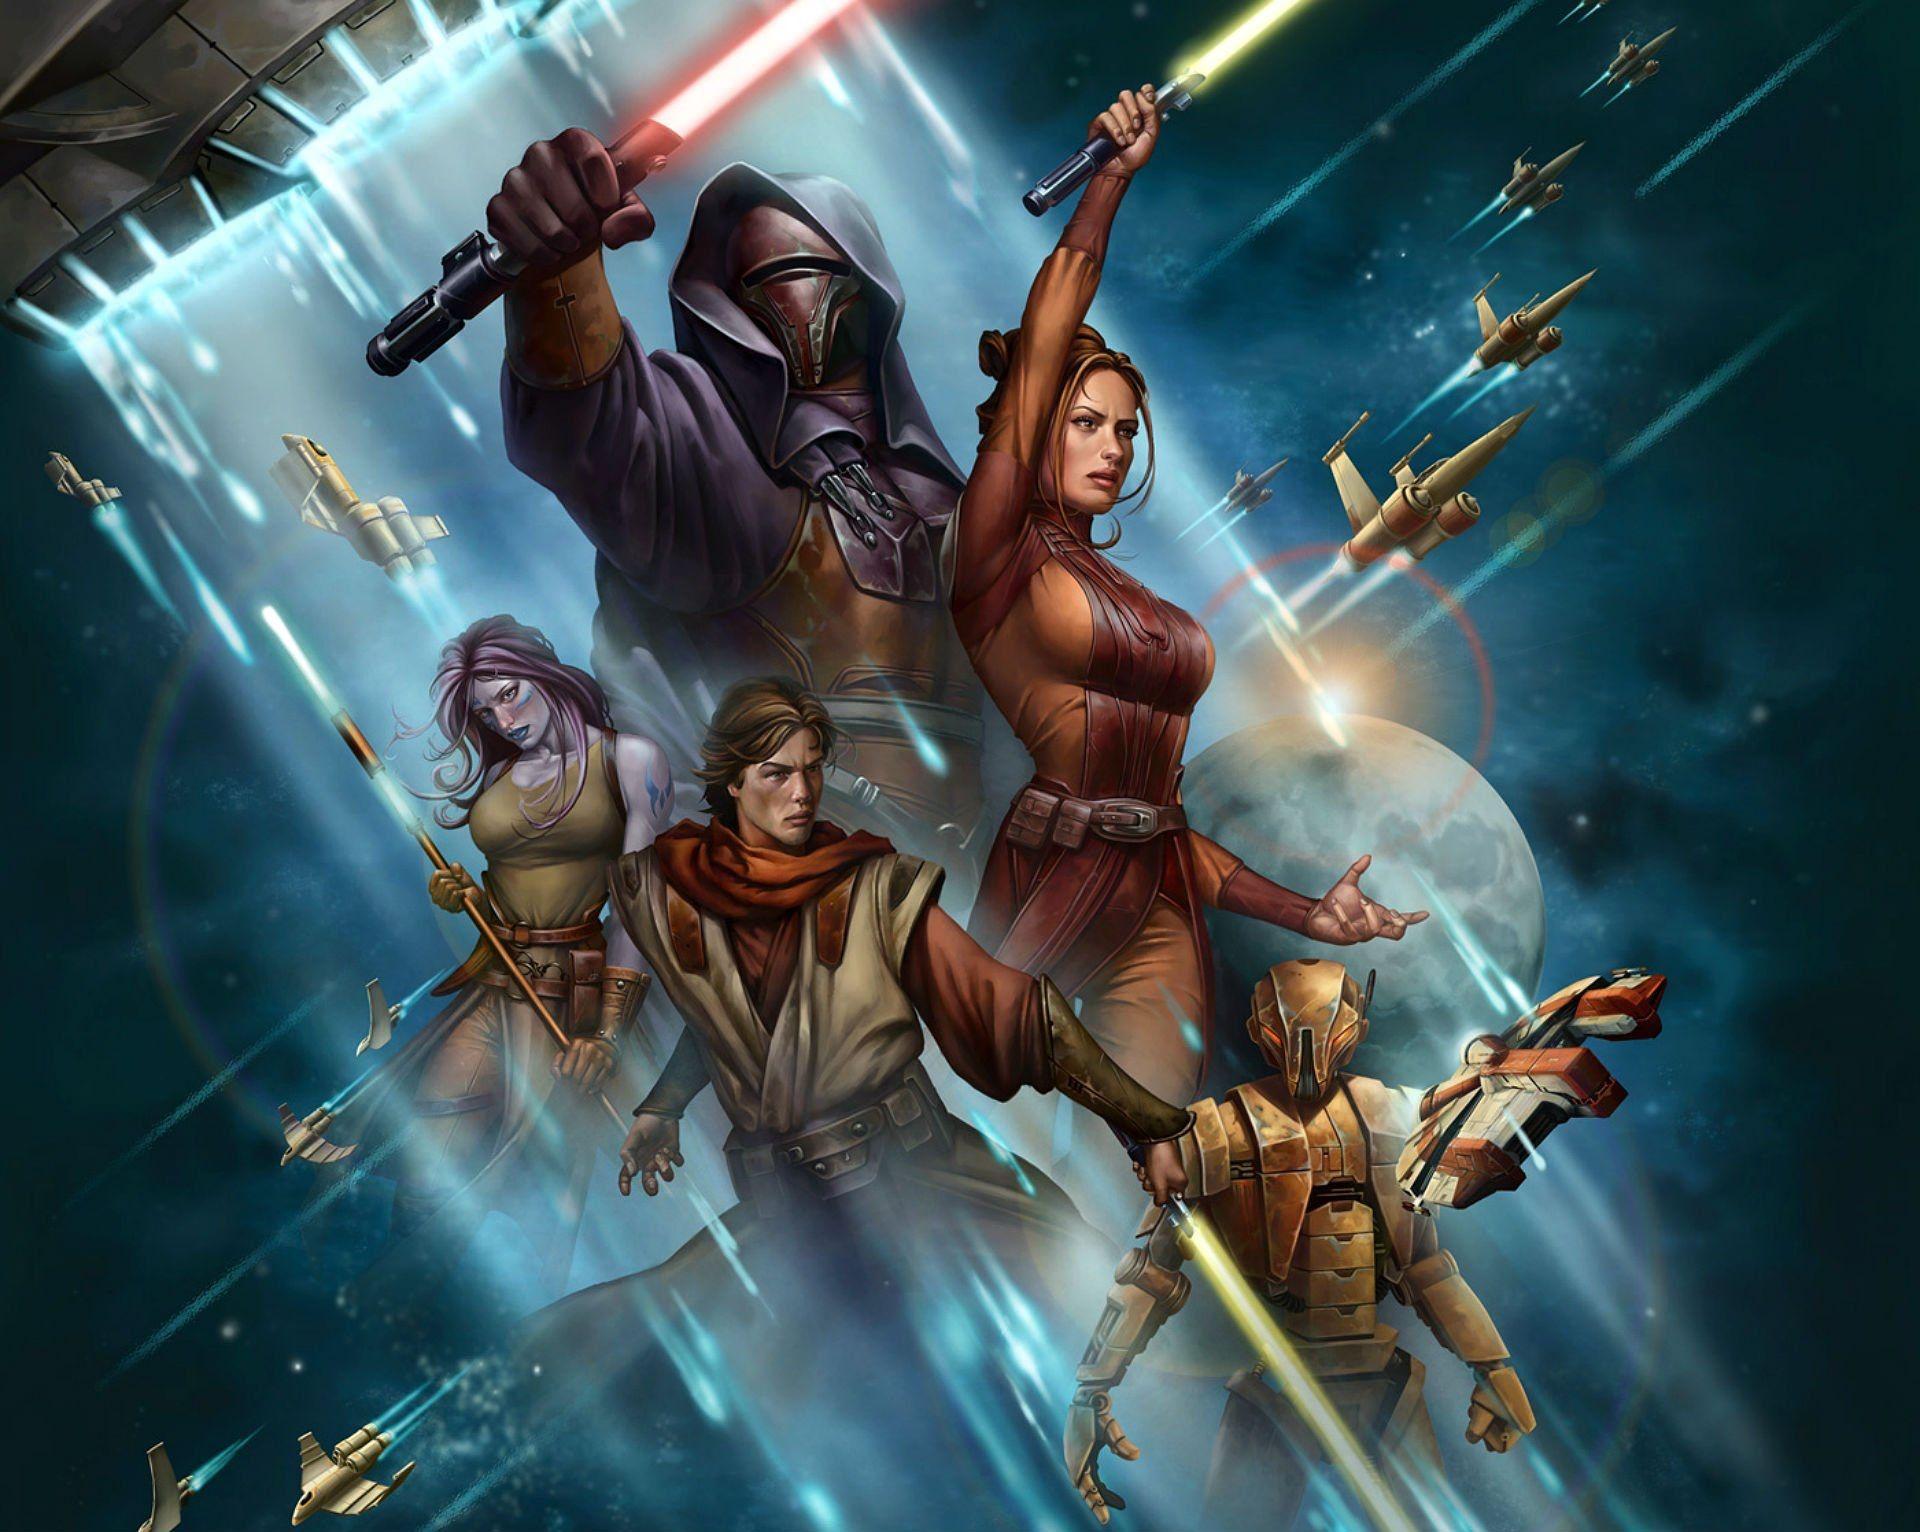 Star Wars High Resolution Wallpaper Star Wars The Old Star Wars Rpg Star Wars Poster